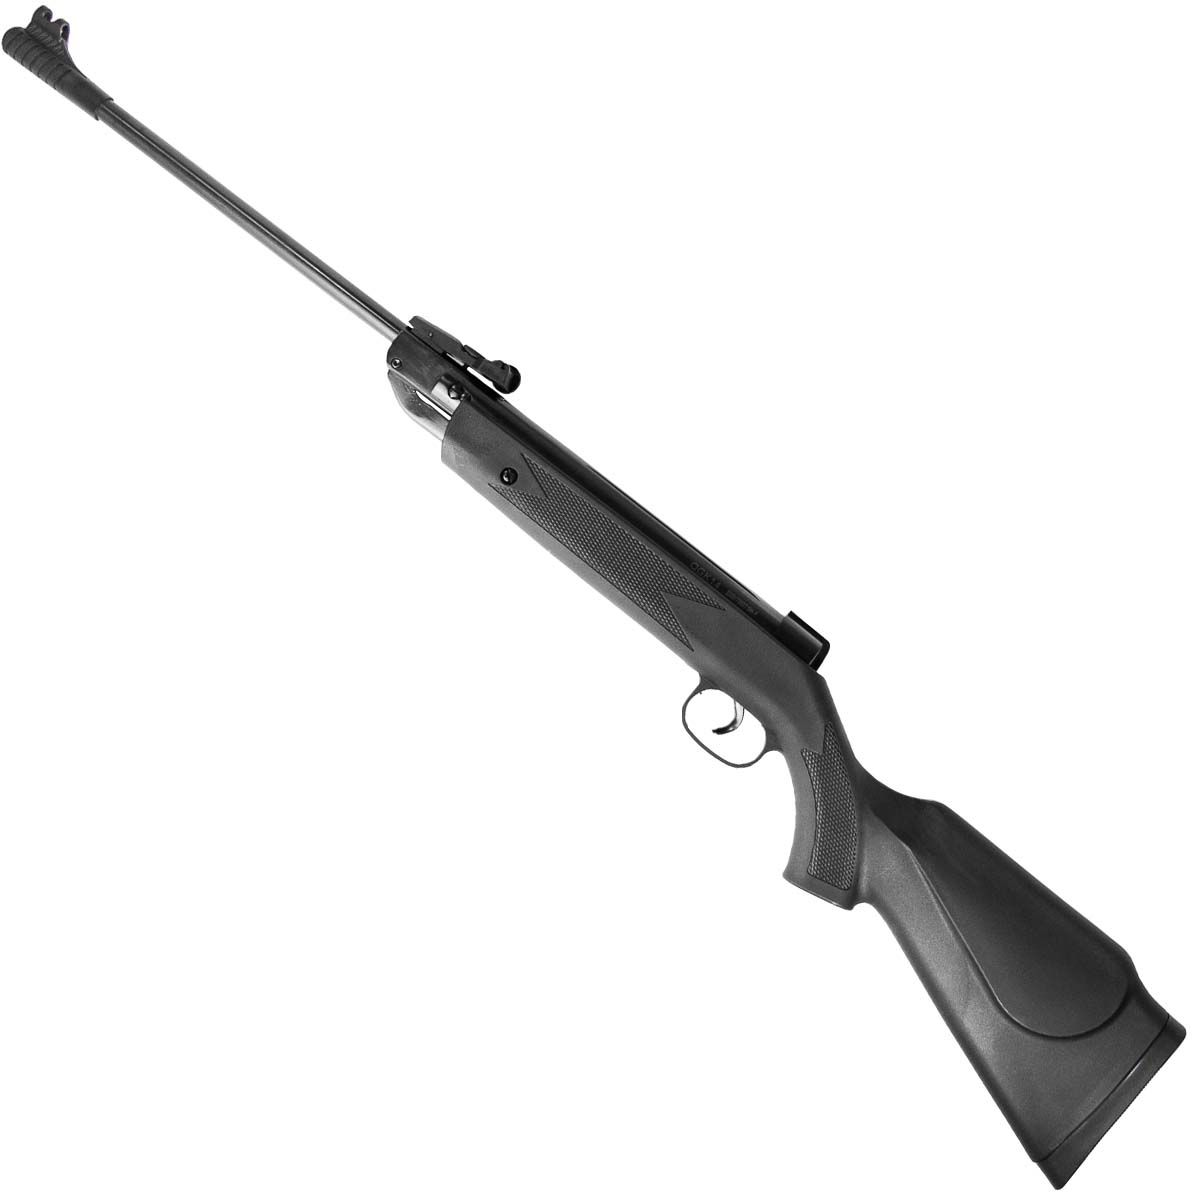 Carabina de Pressão QGK 5,5mm Black Edition